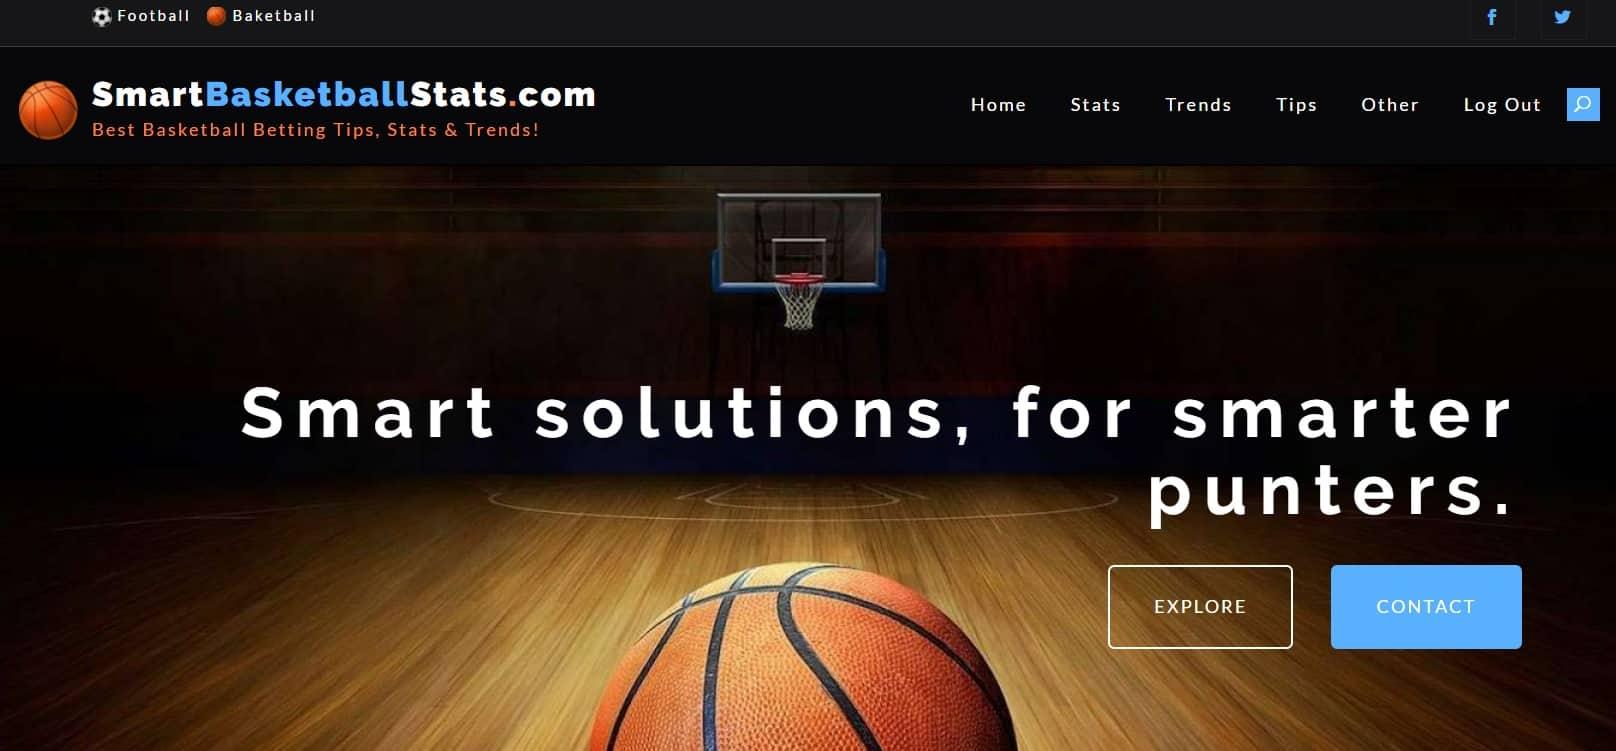 Smart Basketball Stats